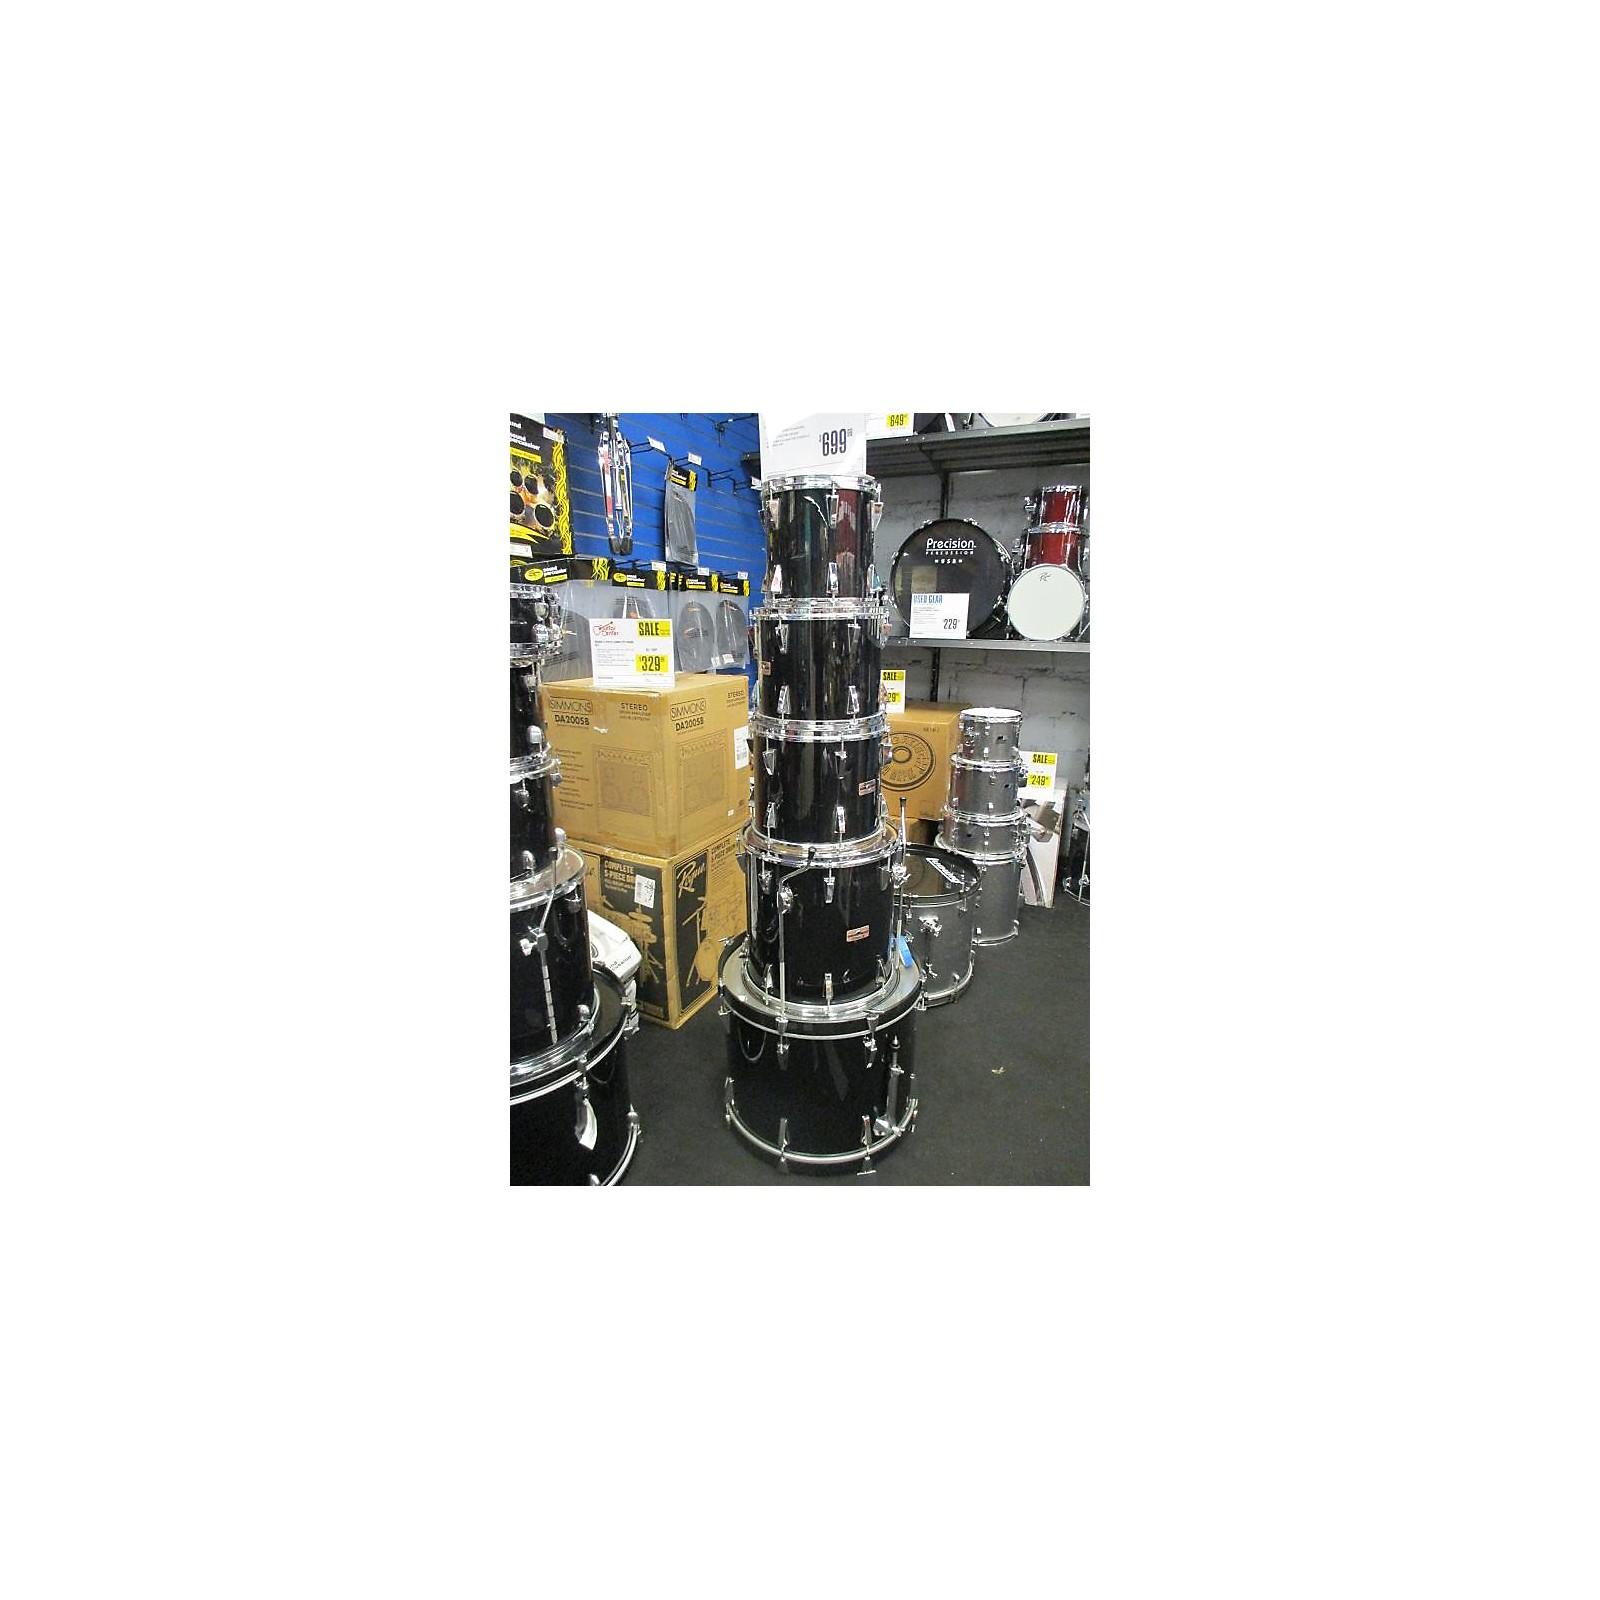 Yamaha Stage Series Drum Kit